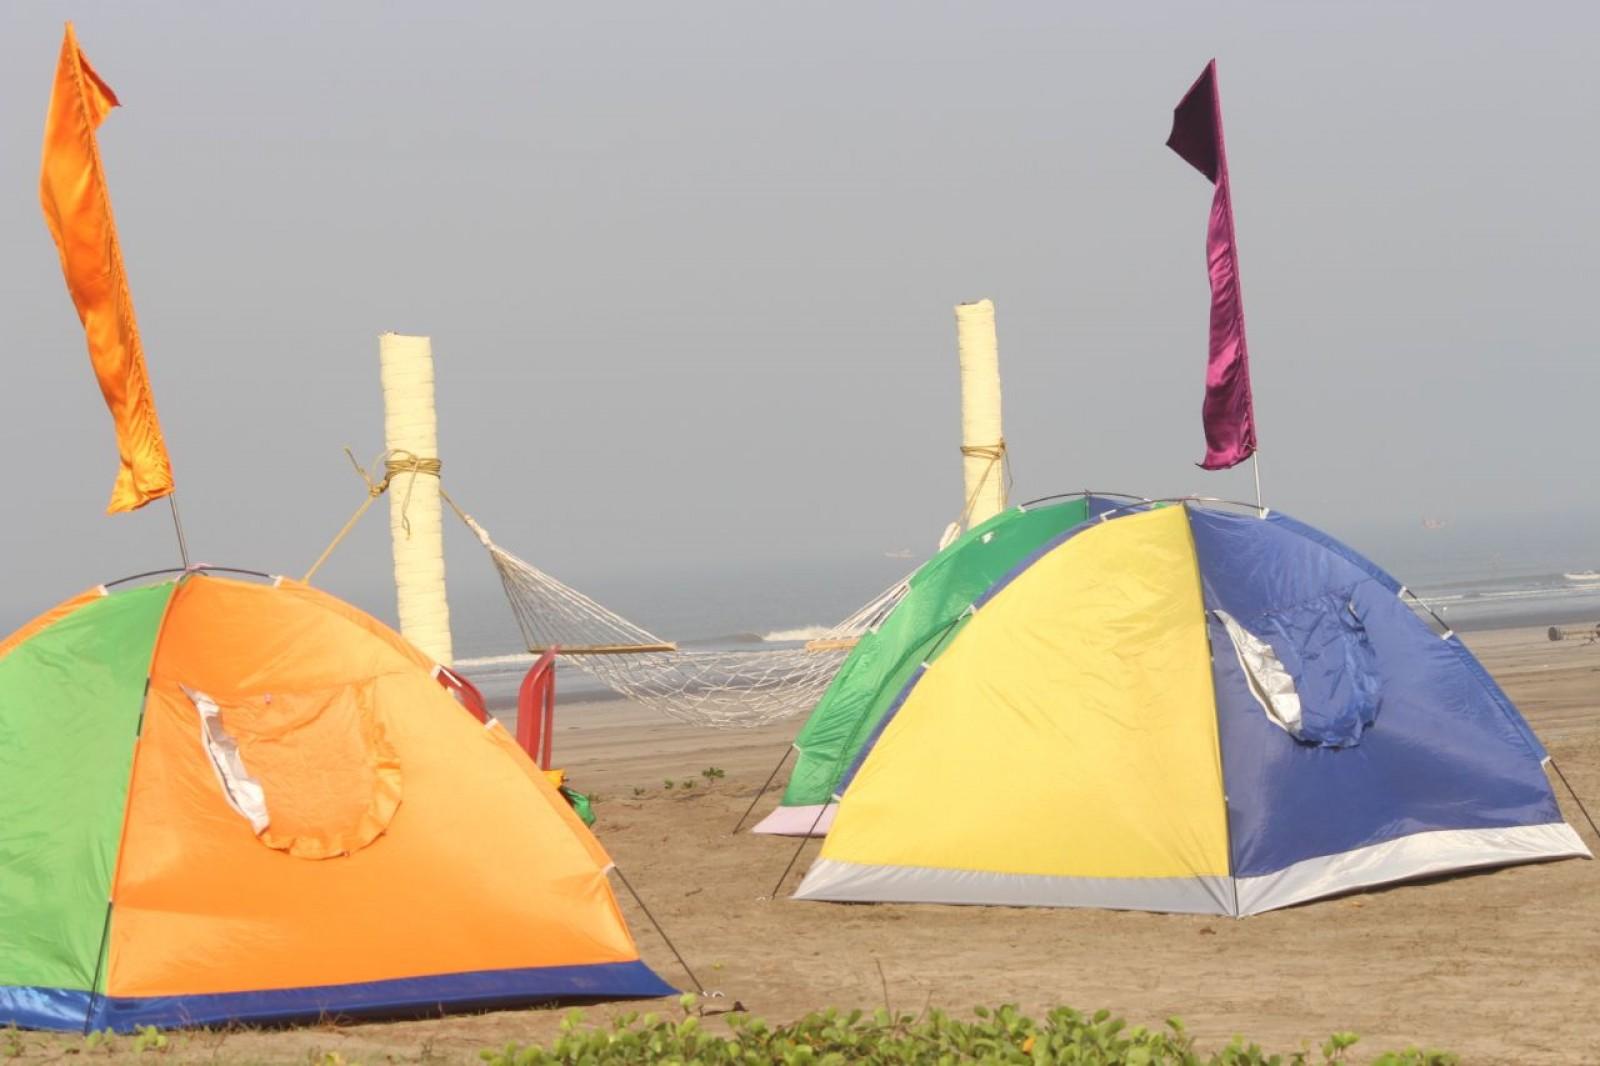 http://www.thegreatnext.com/Revdanda Alibaug Beach Camping Mumbai Pune The Great Next